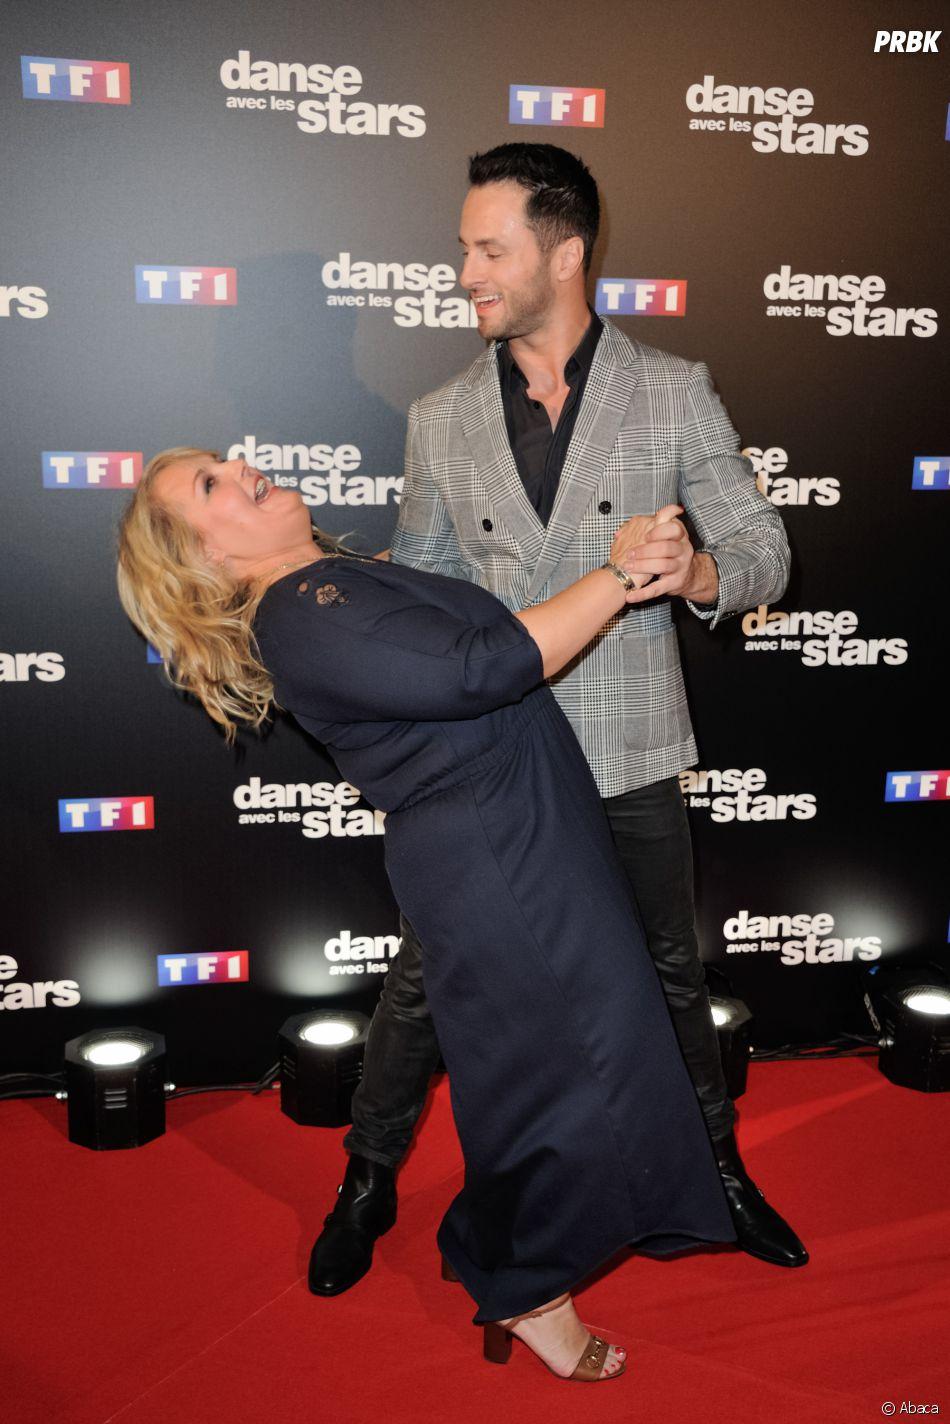 Valérie Damidot dansera avec Christian Millette dans Danse avec les stars 7.